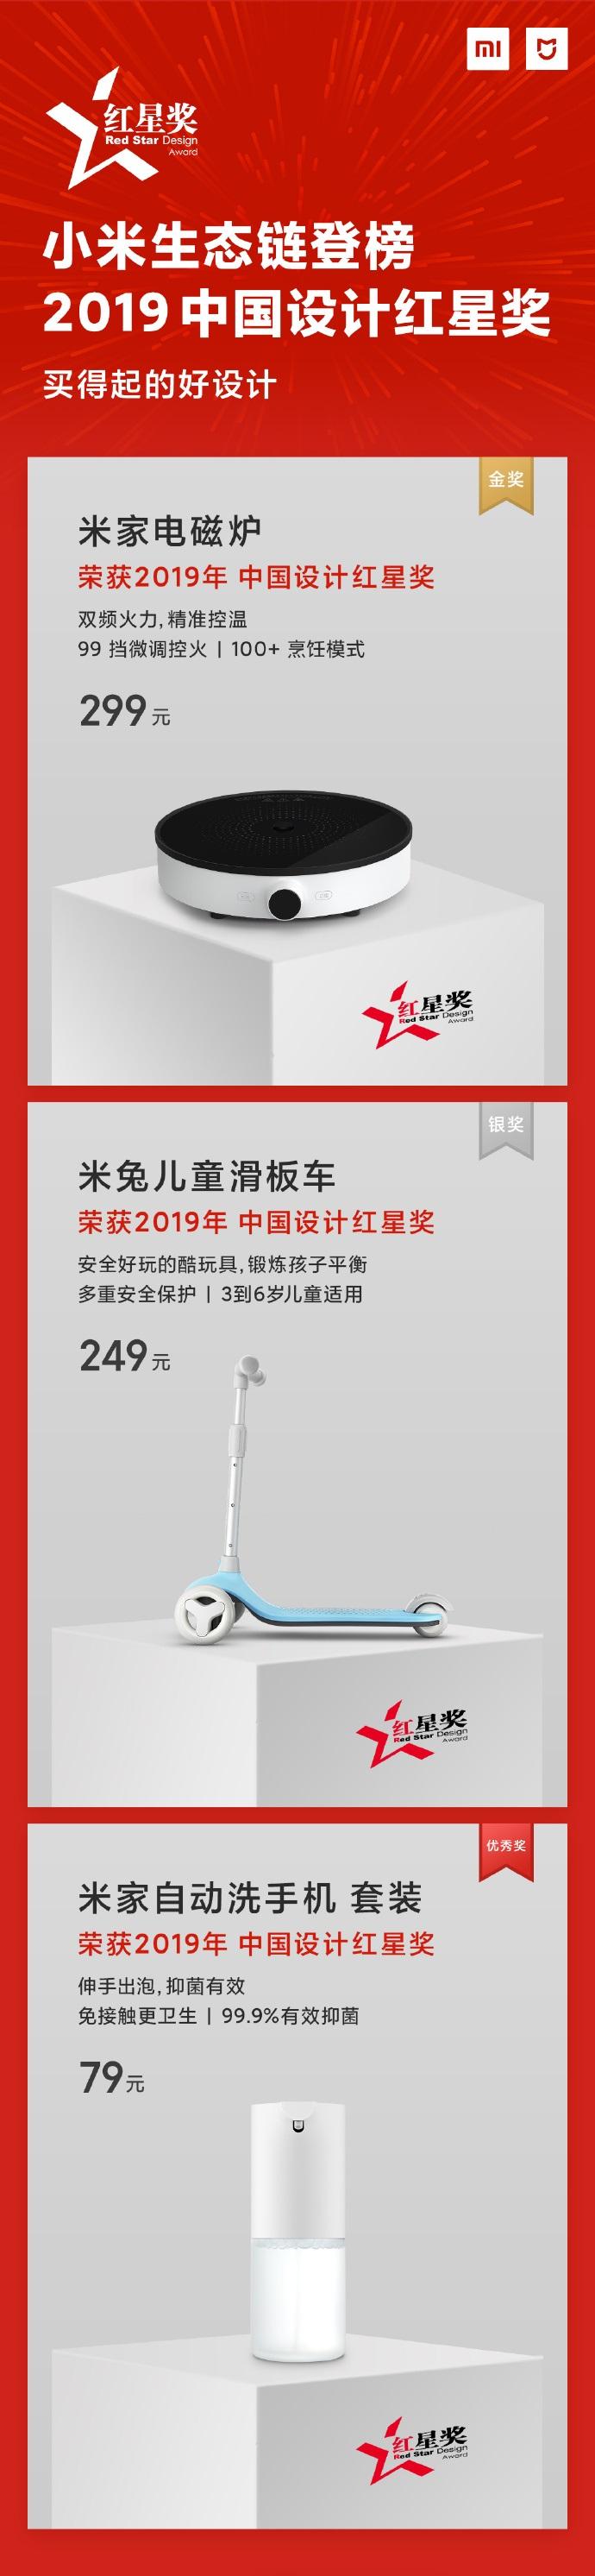 Huawei Mate X wins China Red Star Design Award 2019-cnTechPost